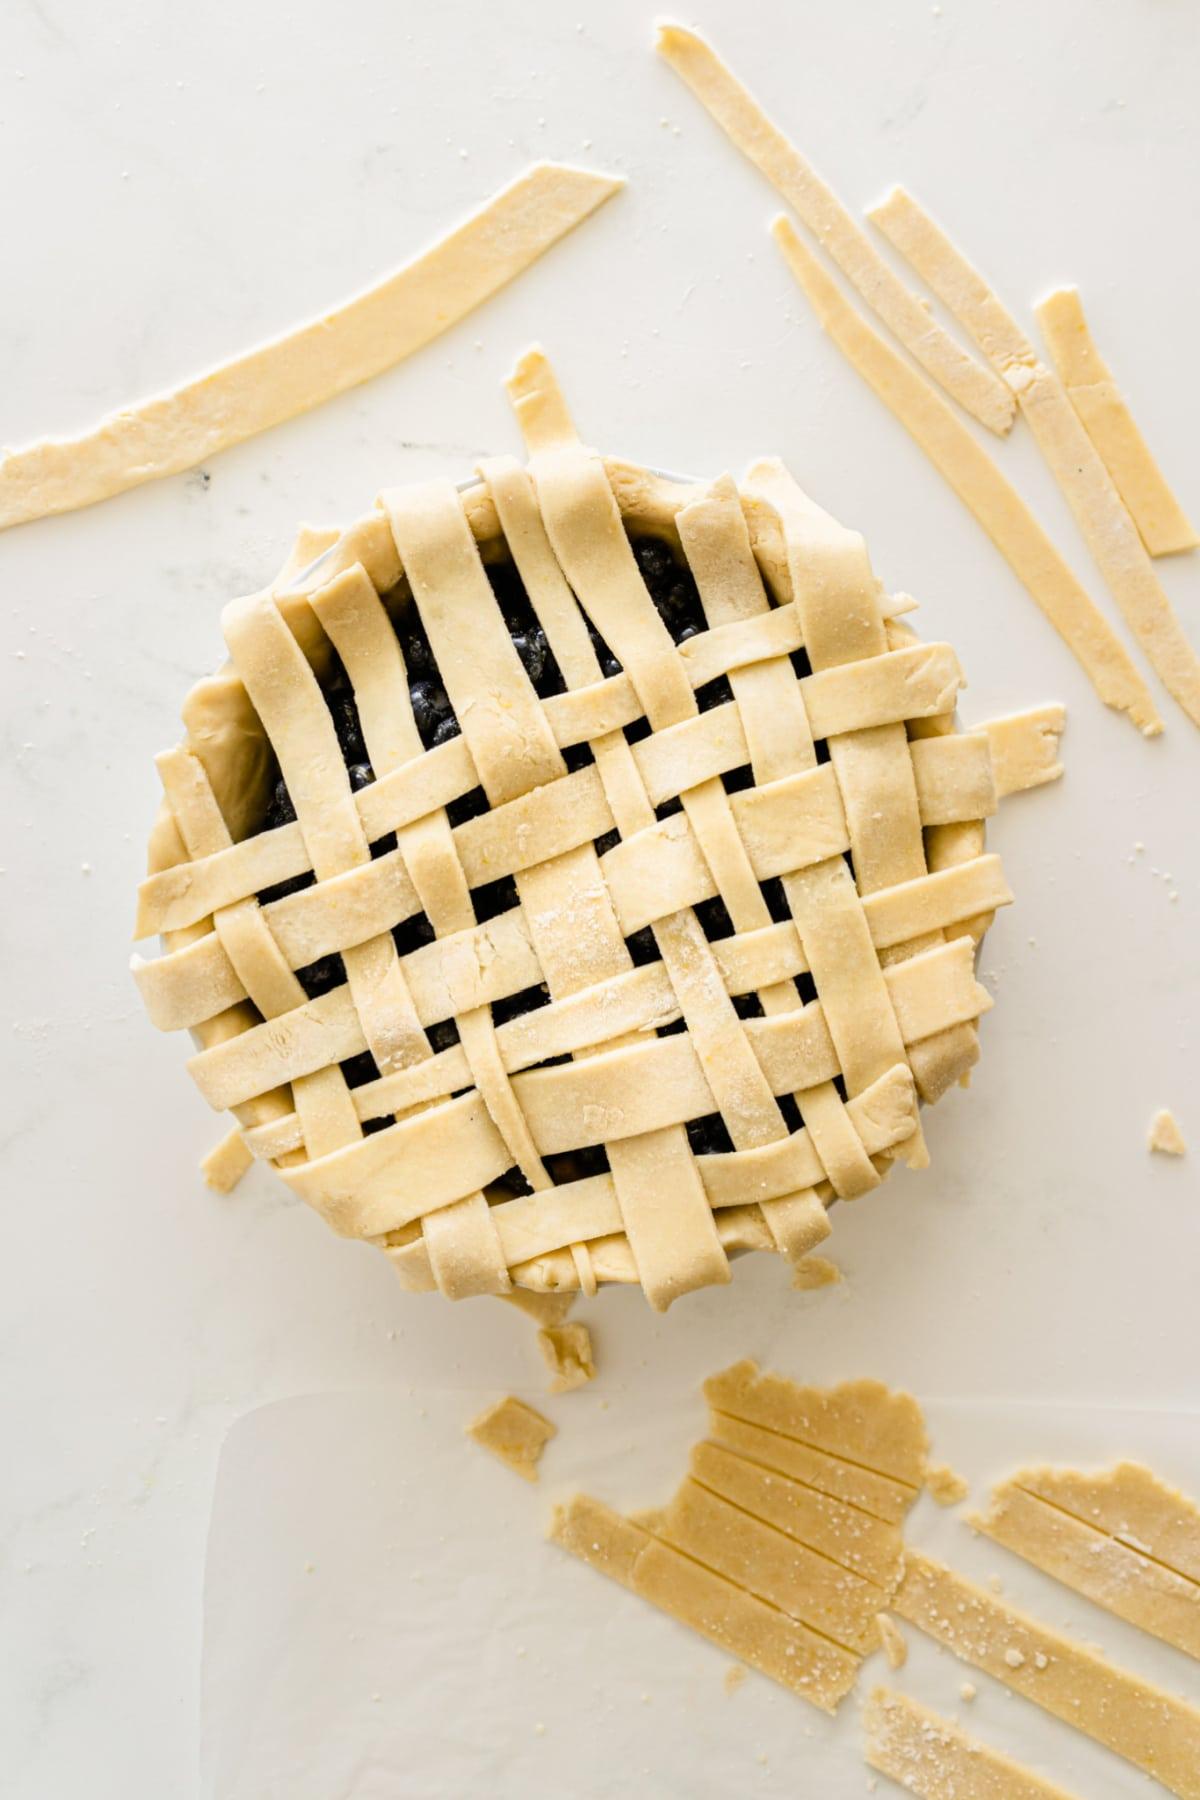 Making lattice crust for blueberry pie